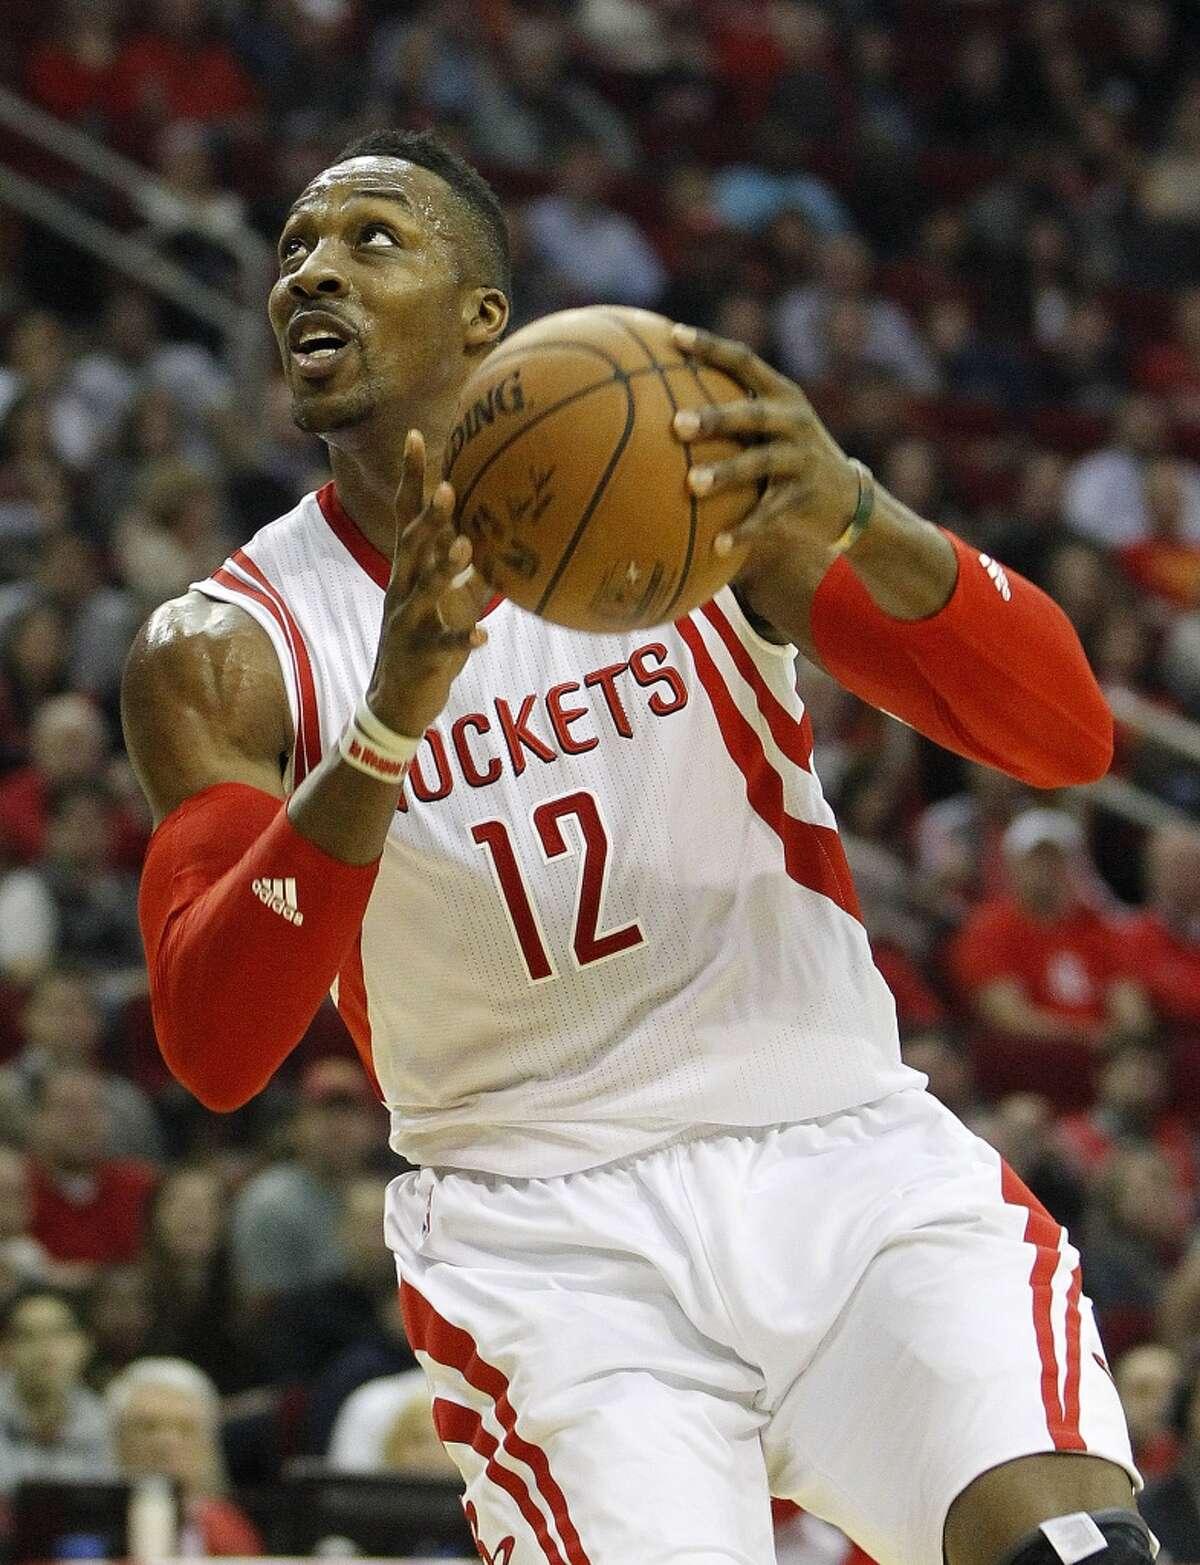 29. Dwight Howard Basketball U.S. Total: $25.5 million Salary/winnings: $20.5 million Endorsements: $5 million